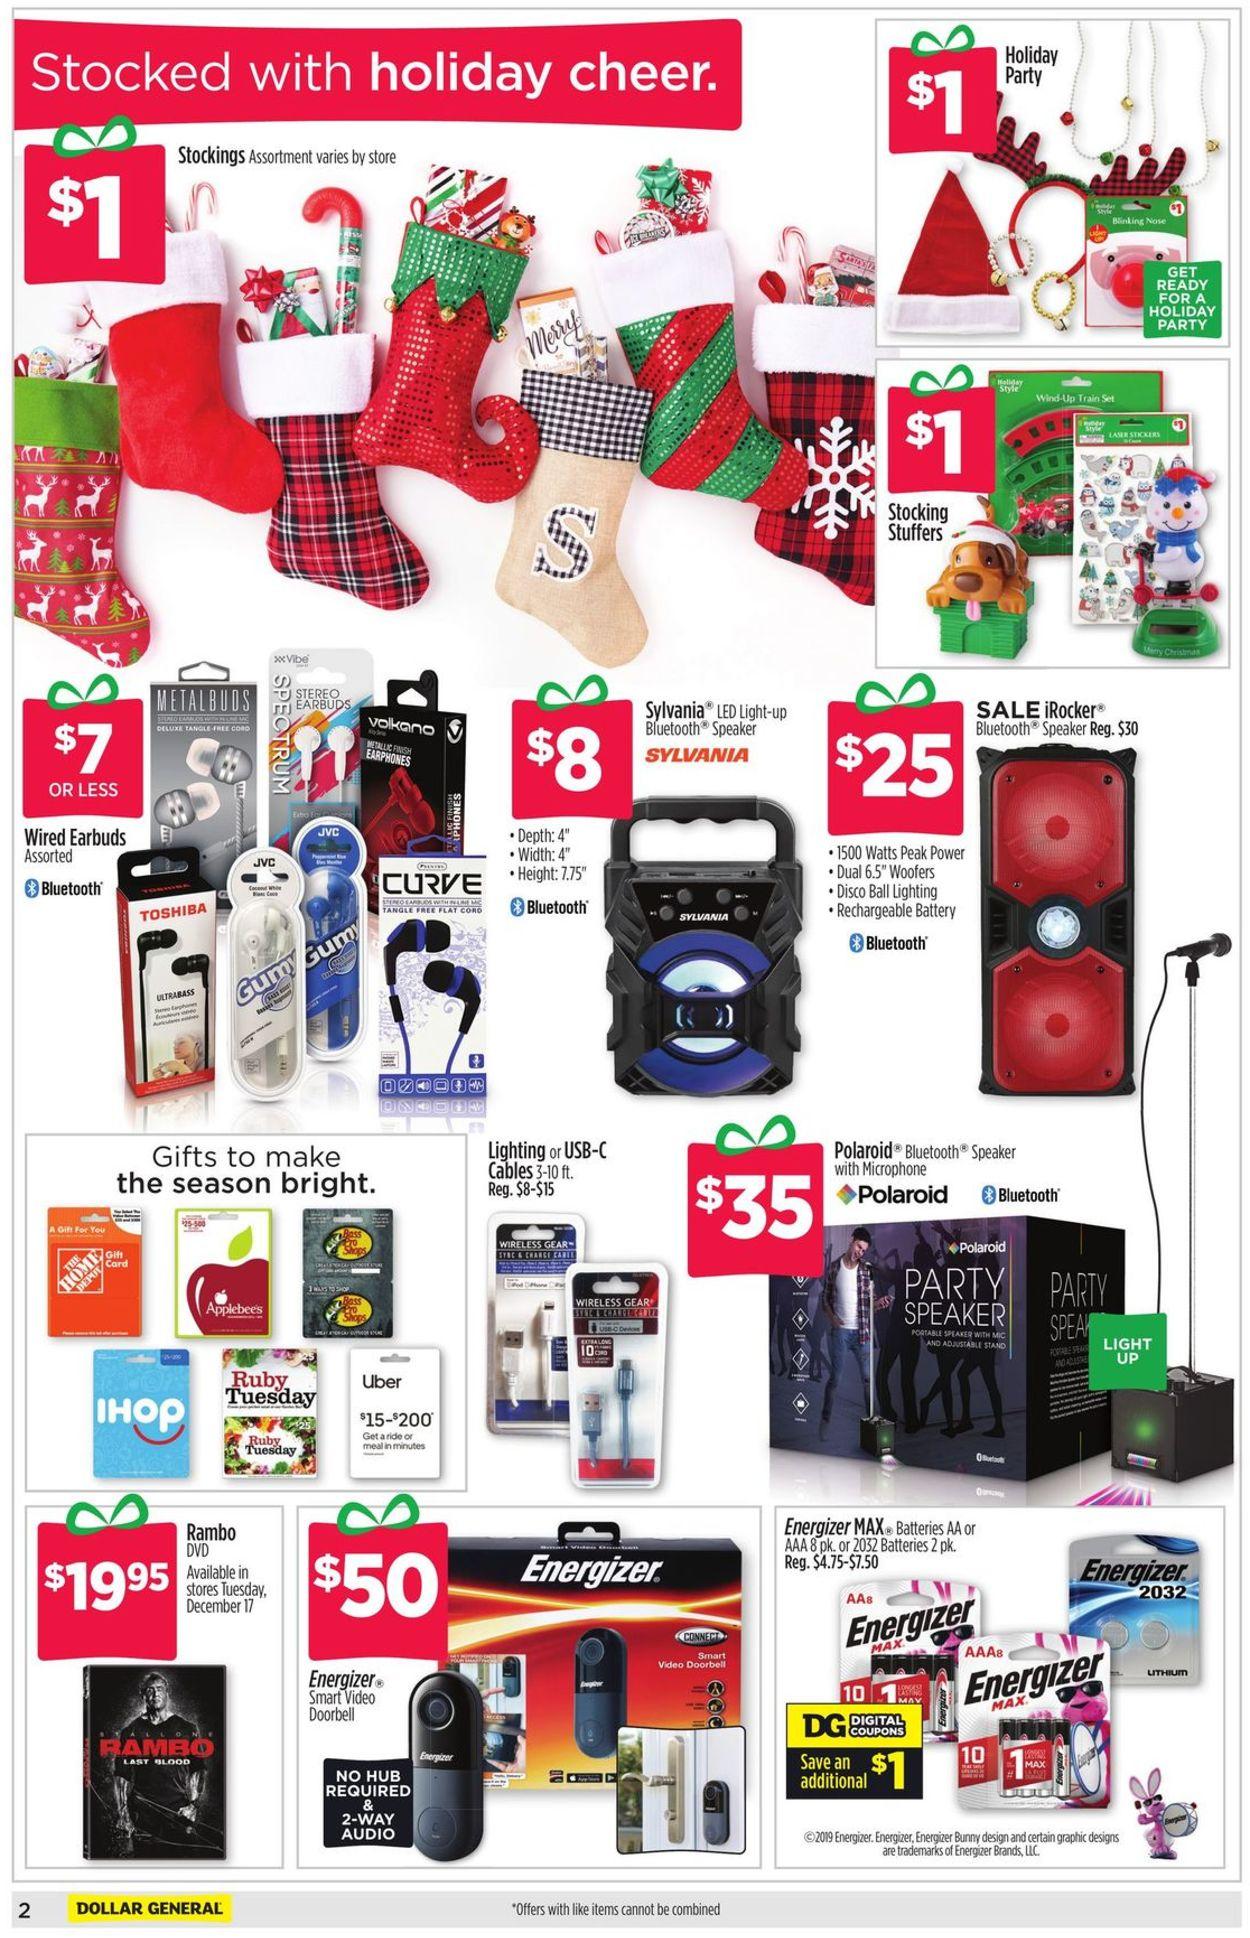 Dollar General - Holidays Ad 10 Current weekly ad 10/10 - 10/10